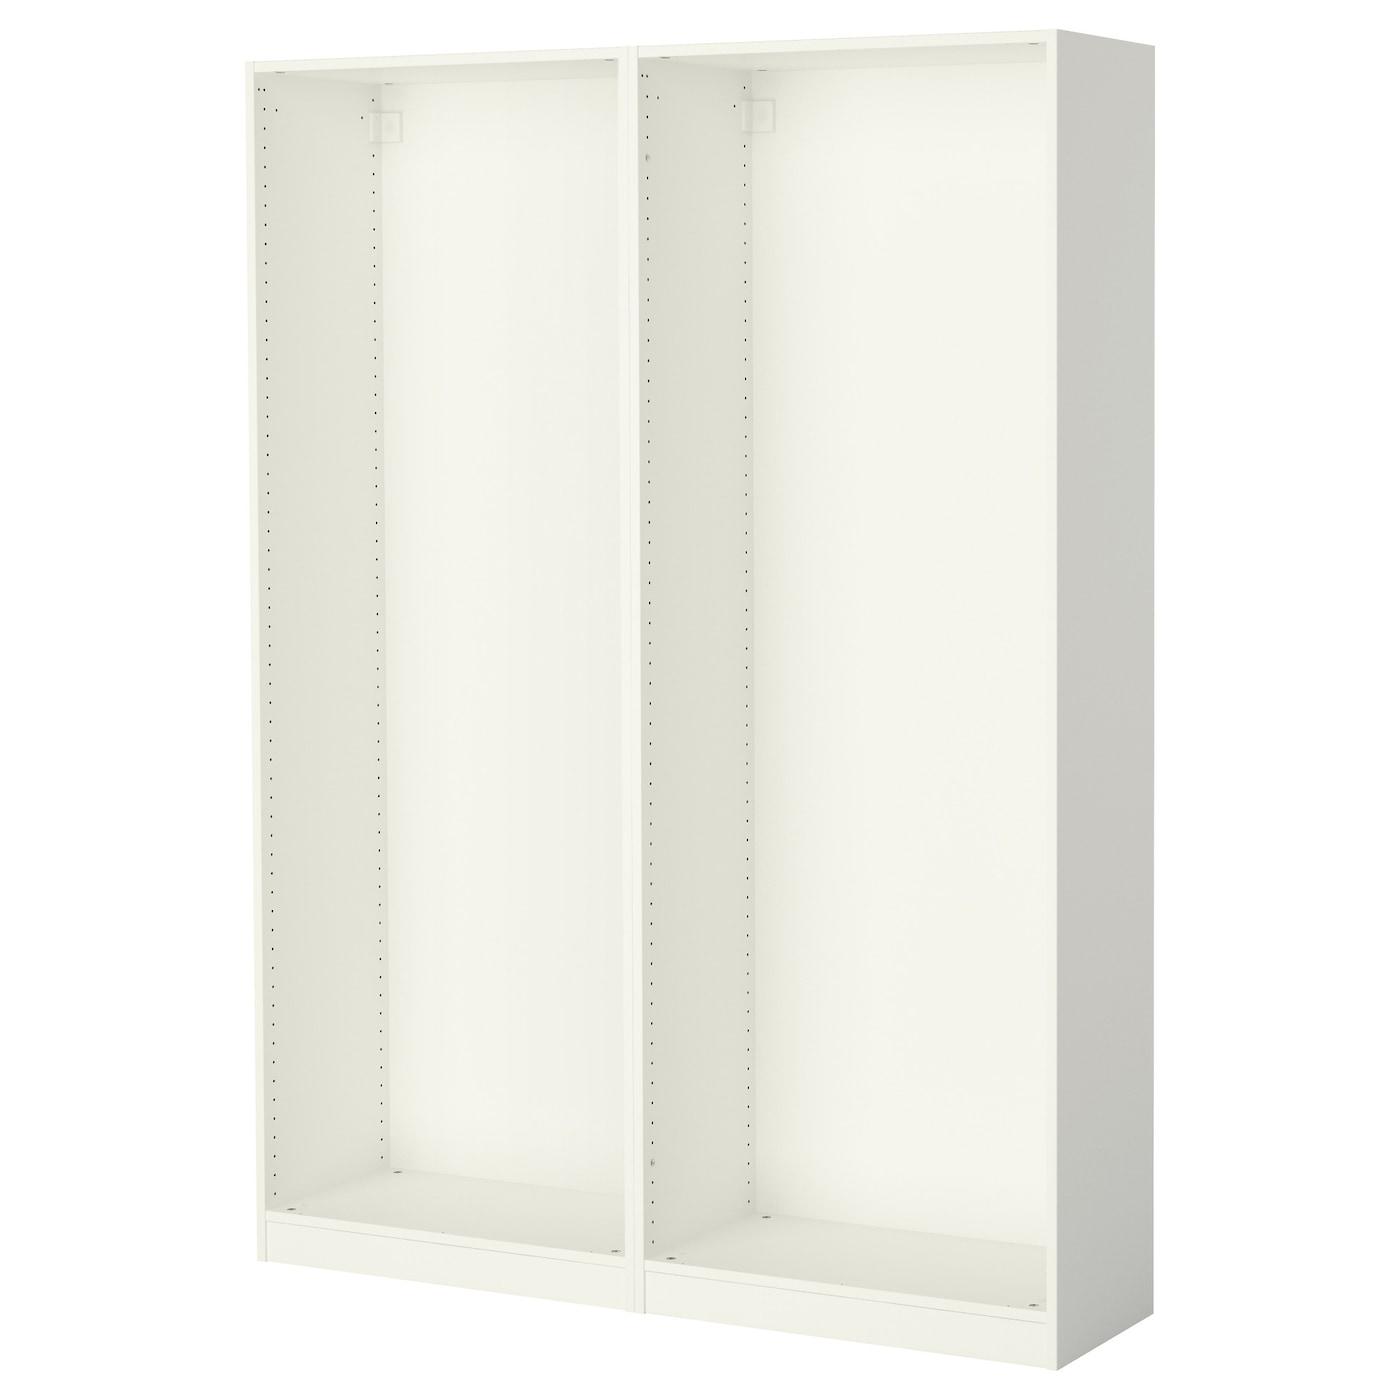 pax 2 caissons armoire blanc 150 x 35 x 201 cm ikea. Black Bedroom Furniture Sets. Home Design Ideas